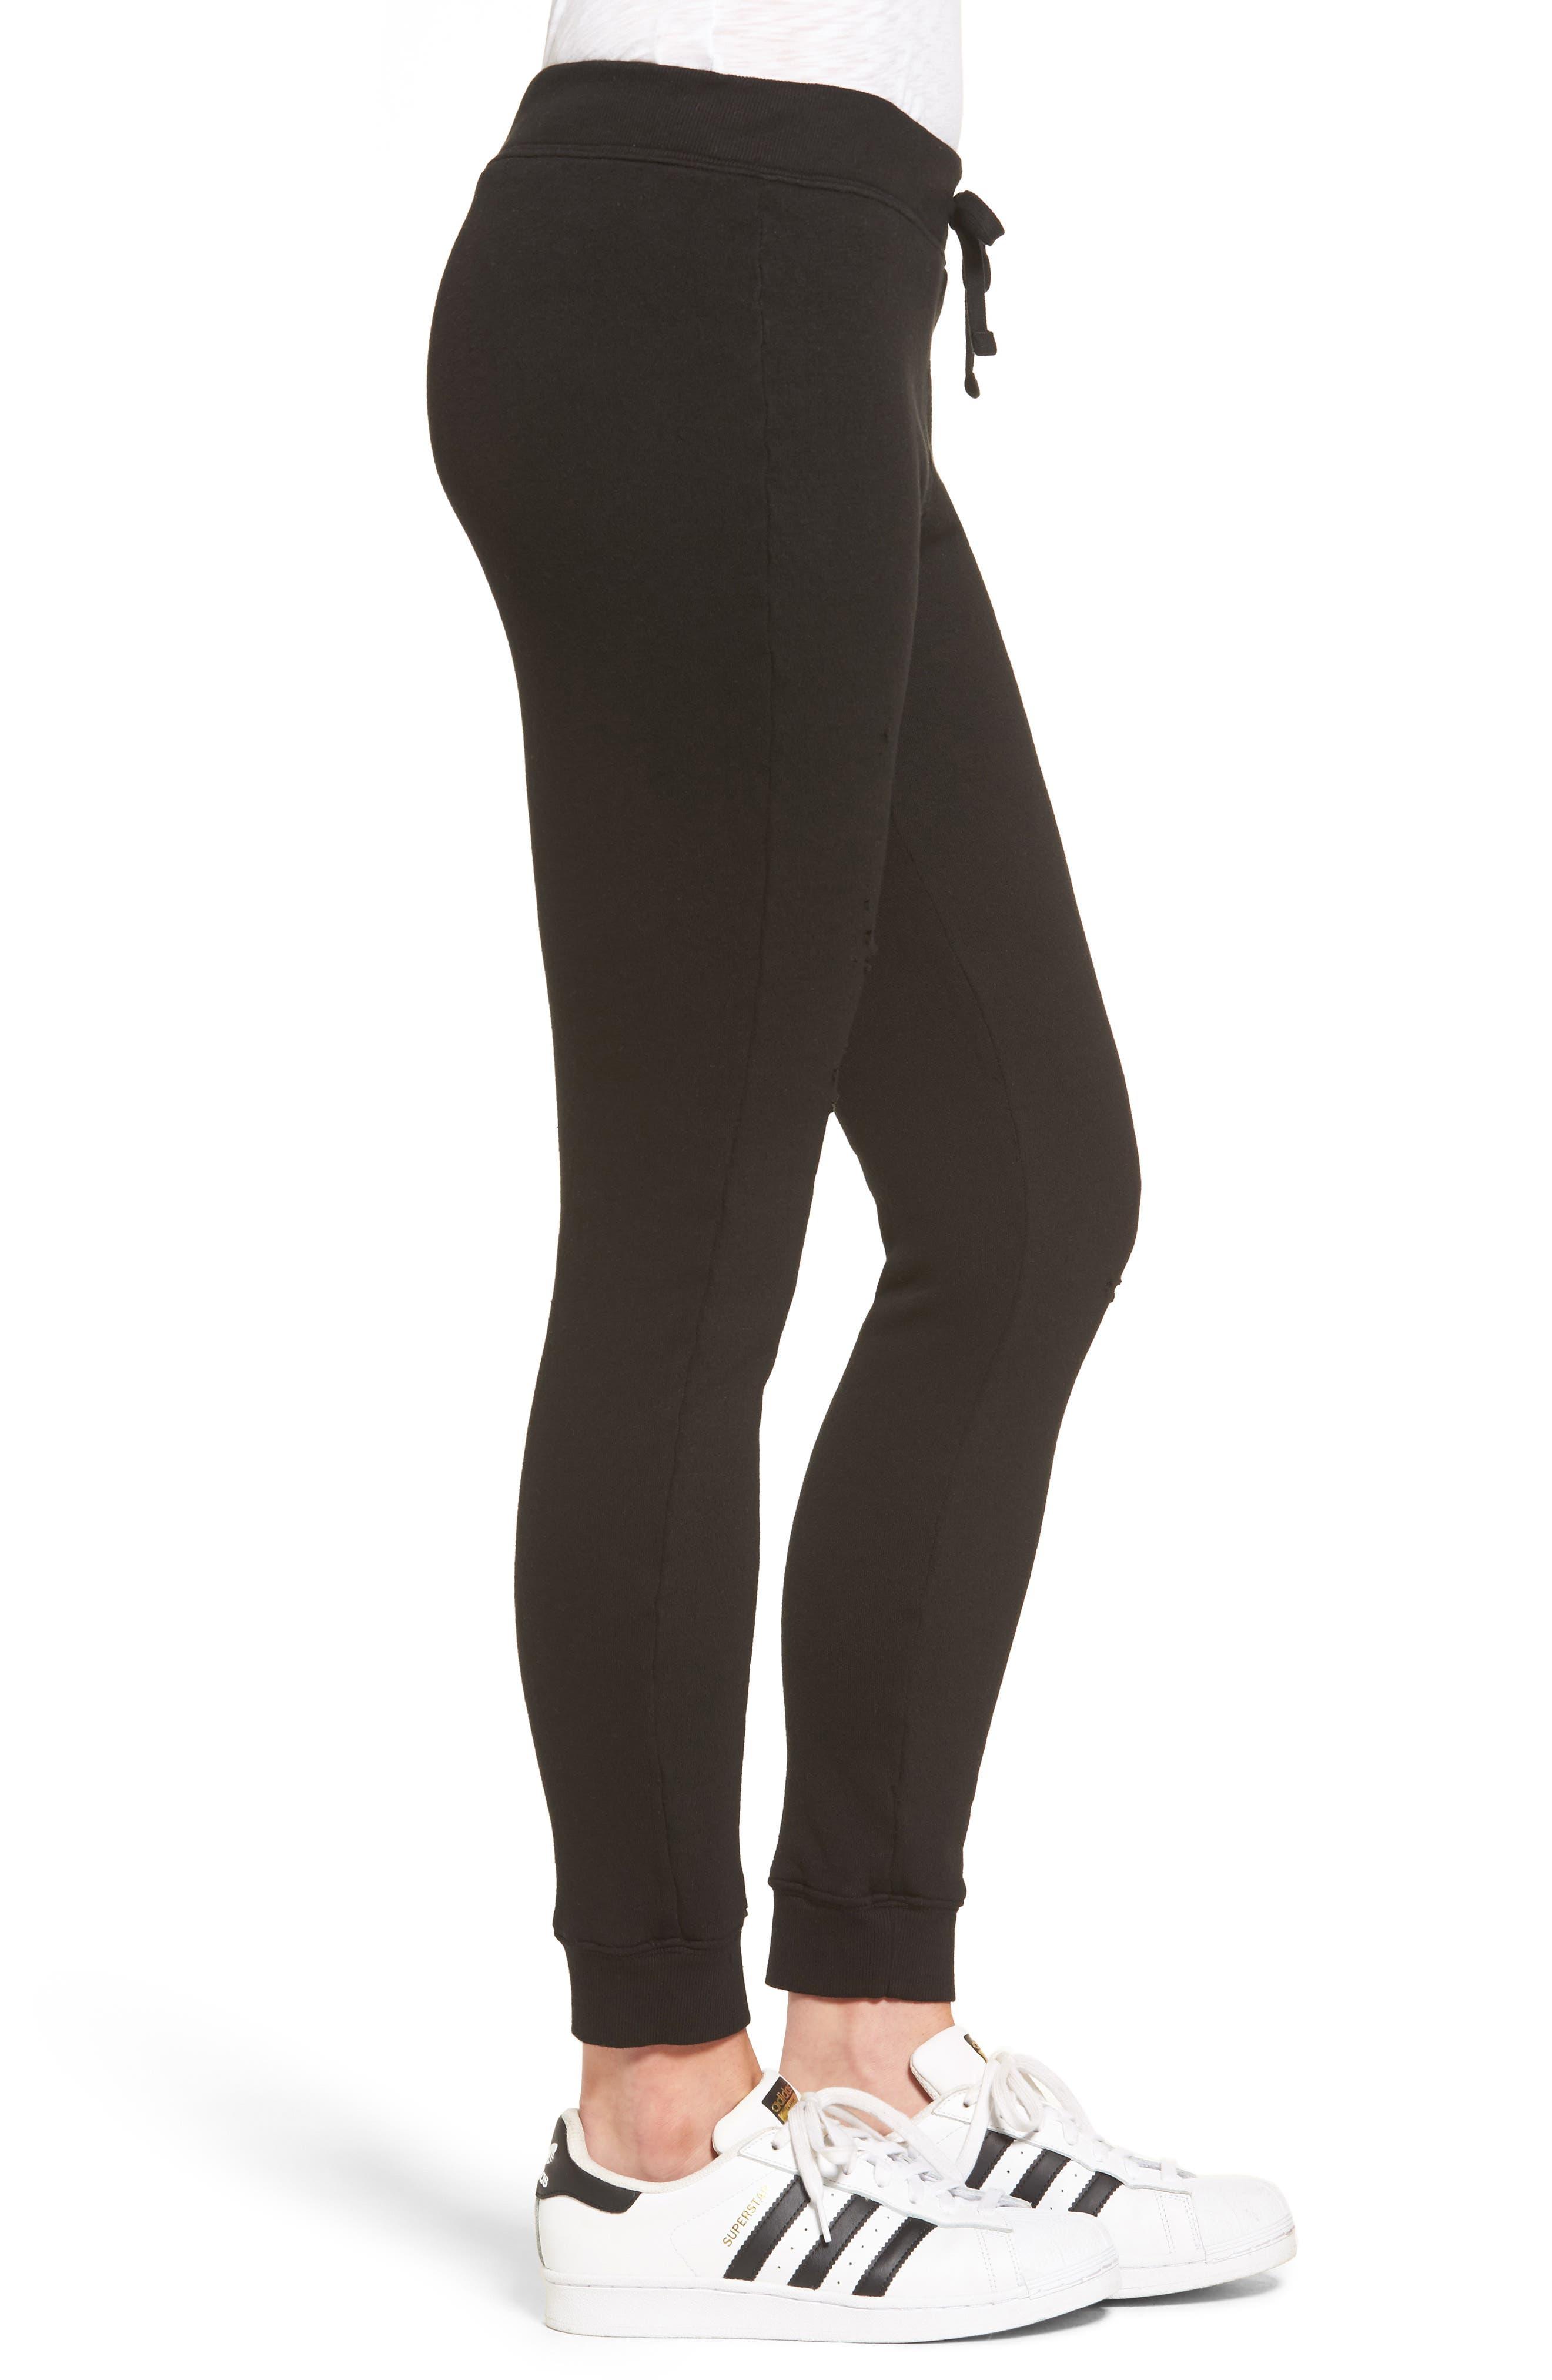 Betsee Distressed Jogger Pants,                             Alternate thumbnail 3, color,                             Black